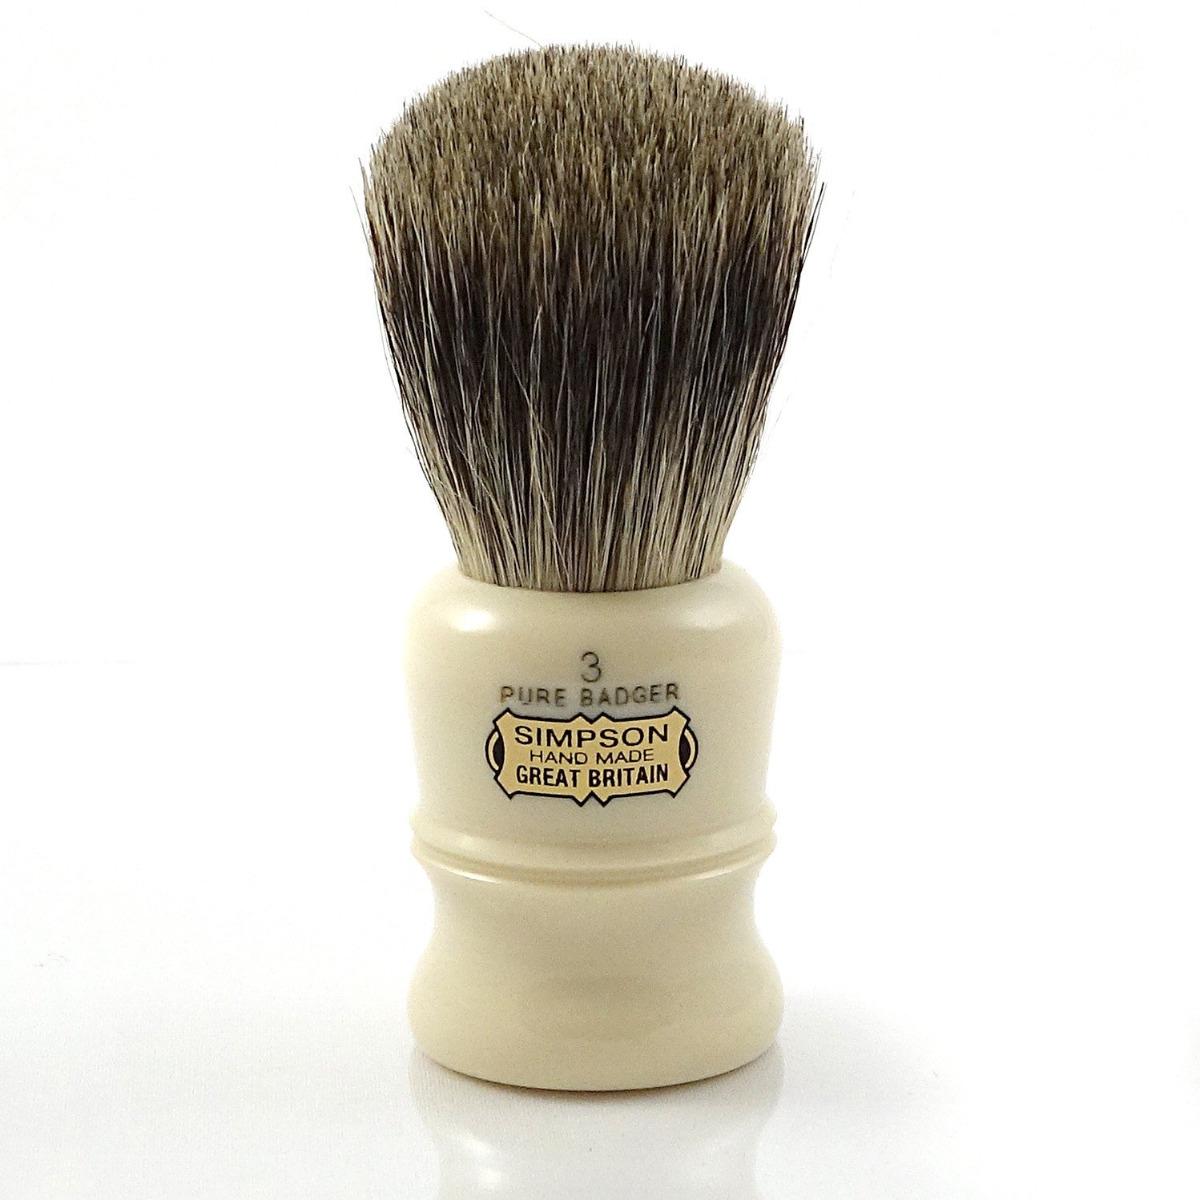 Simpsons Duke 3 Pure Badger Hair Shaving Brush